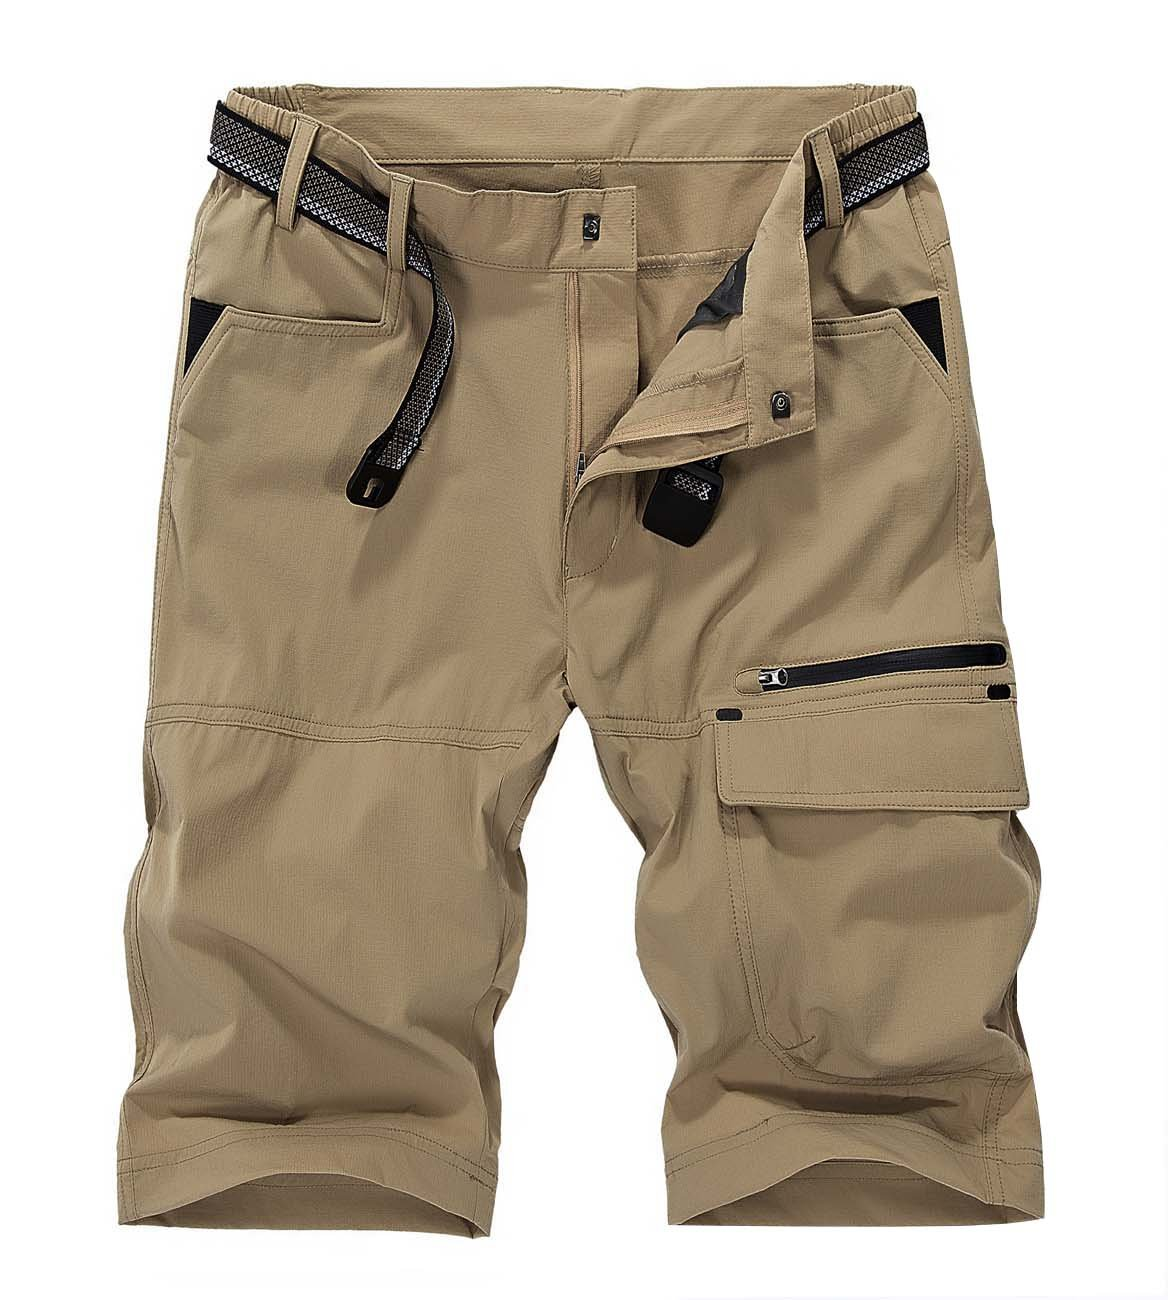 LASIUMIAT Men's Beach Shorts Lightweight Breathable Casual Work Wear Shorts Khaki